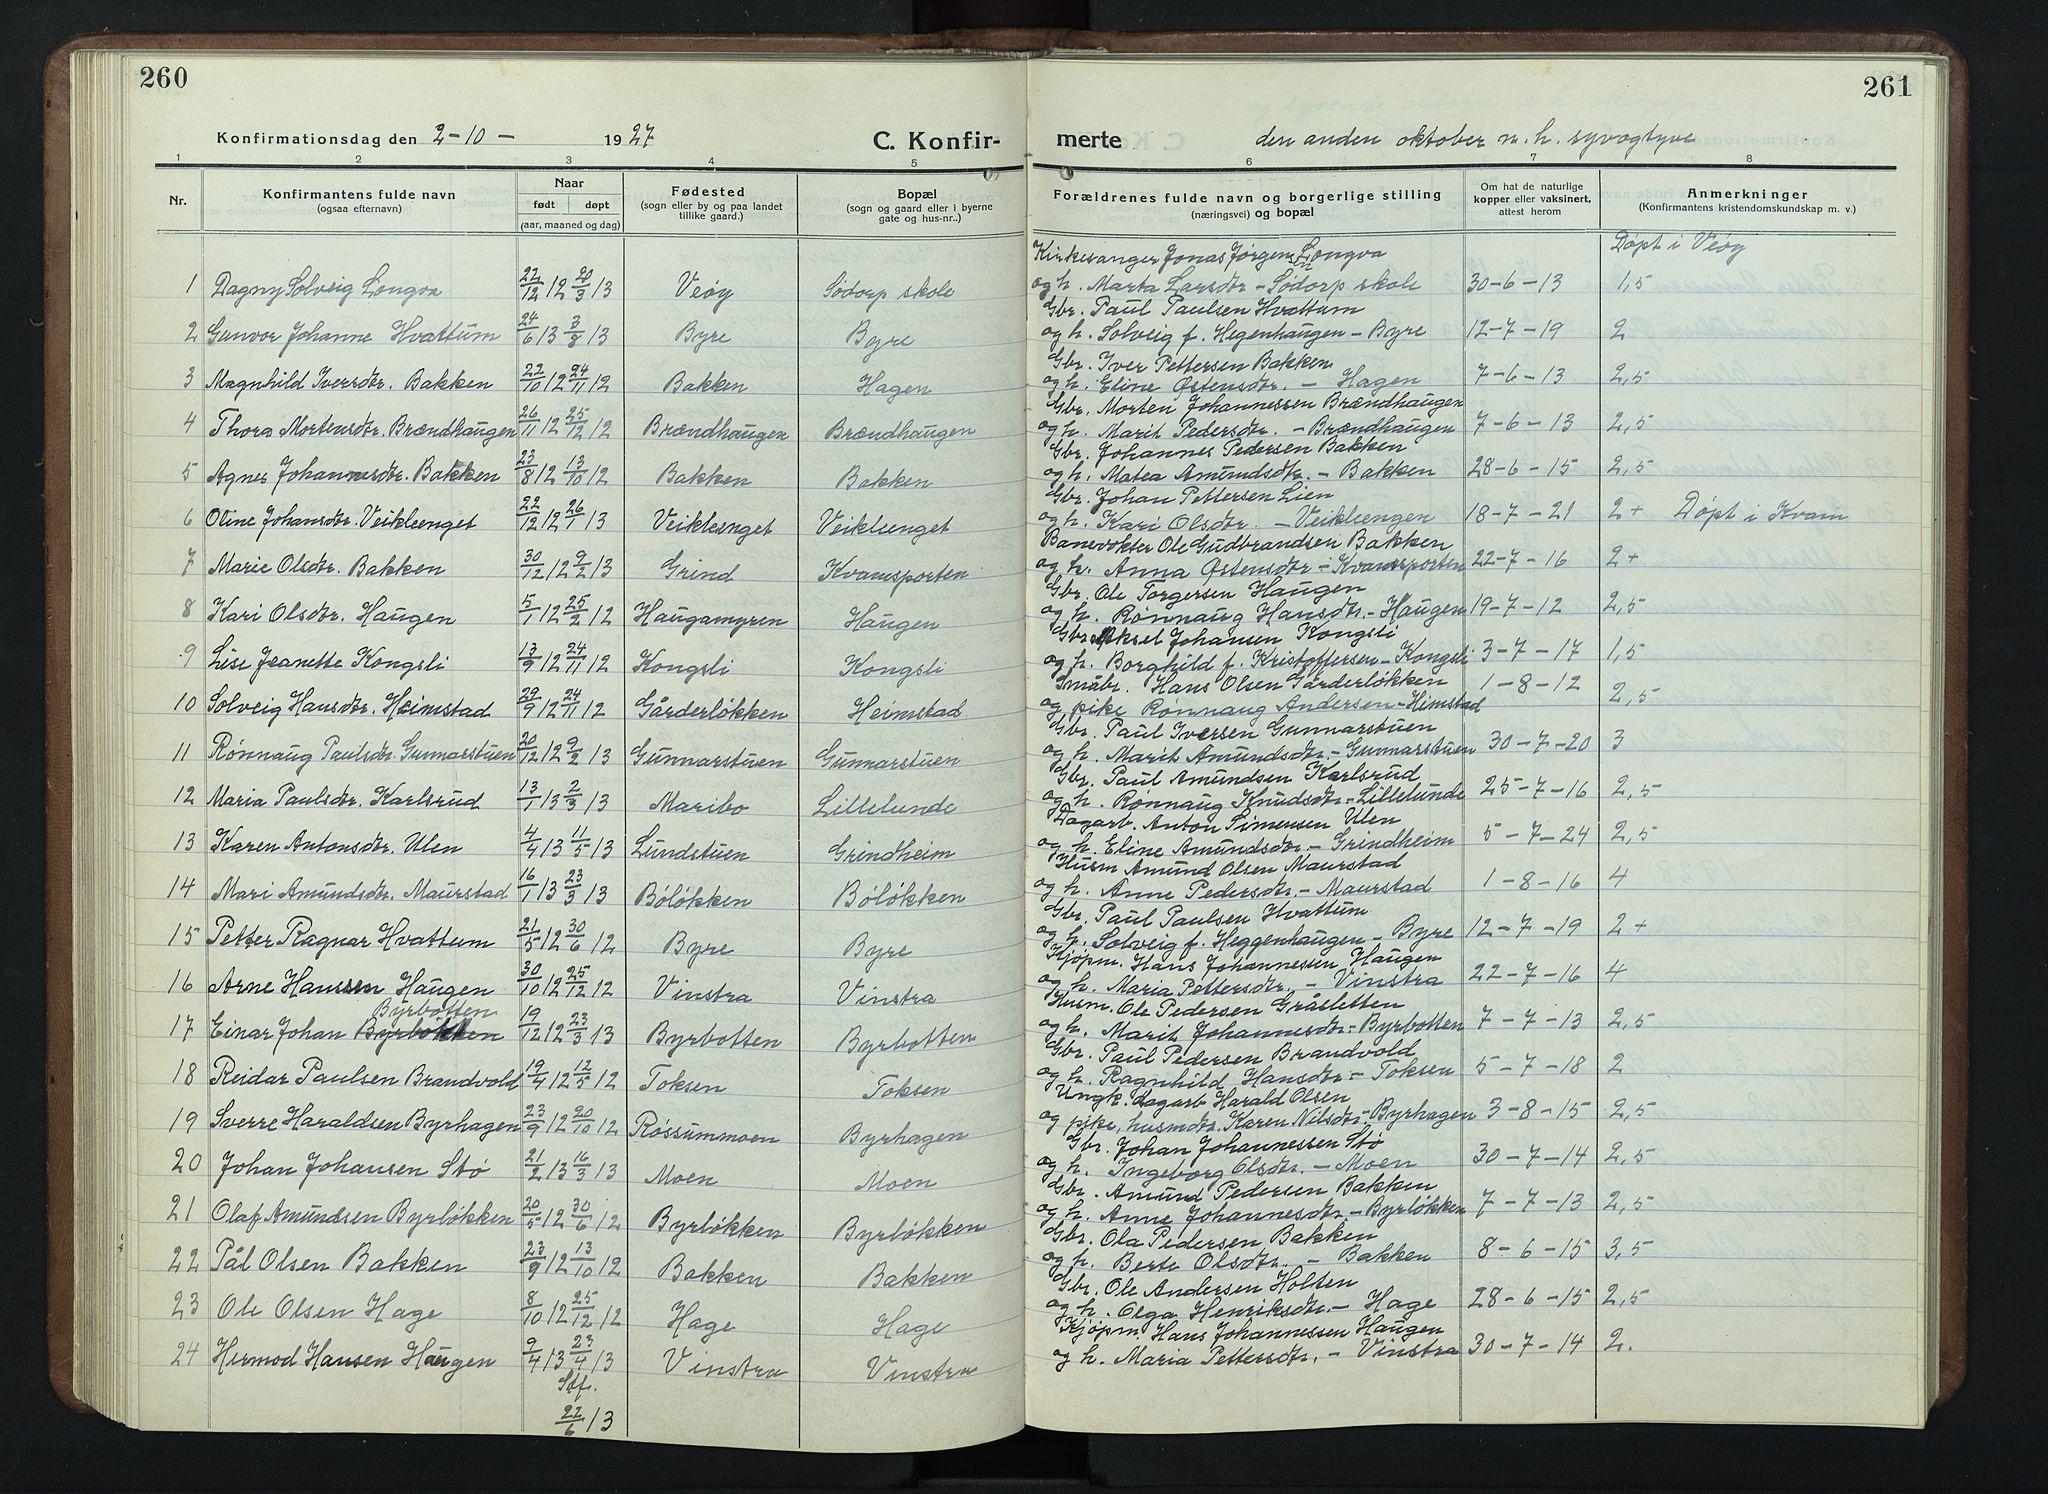 SAH, Nord-Fron prestekontor, Klokkerbok nr. 7, 1915-1946, s. 260-261